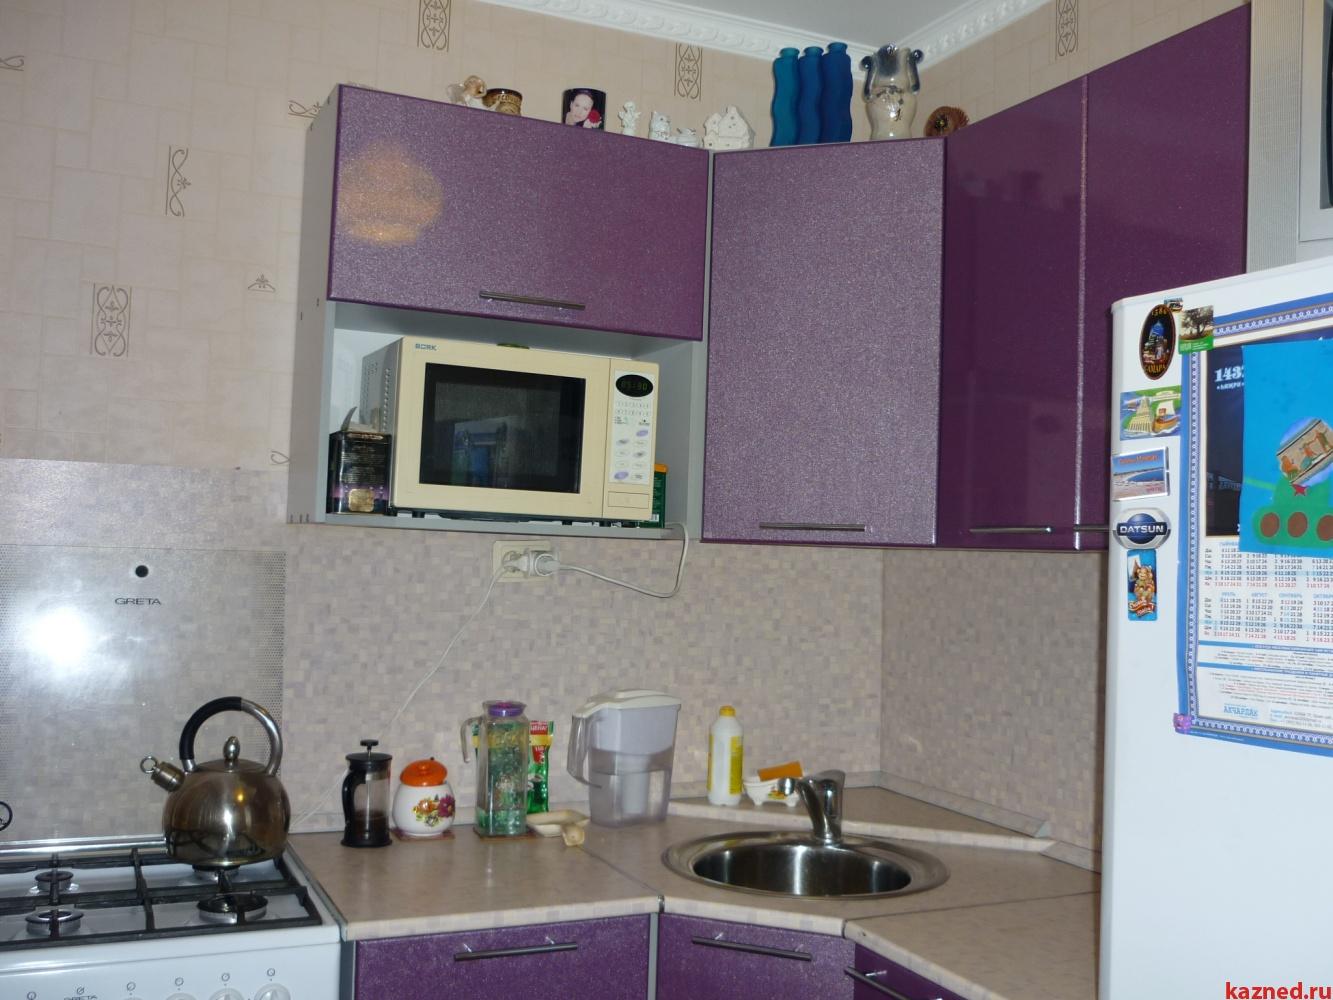 Продажа 1-к квартиры Фатыха Амирхана д.53б, 38 м² (миниатюра №8)